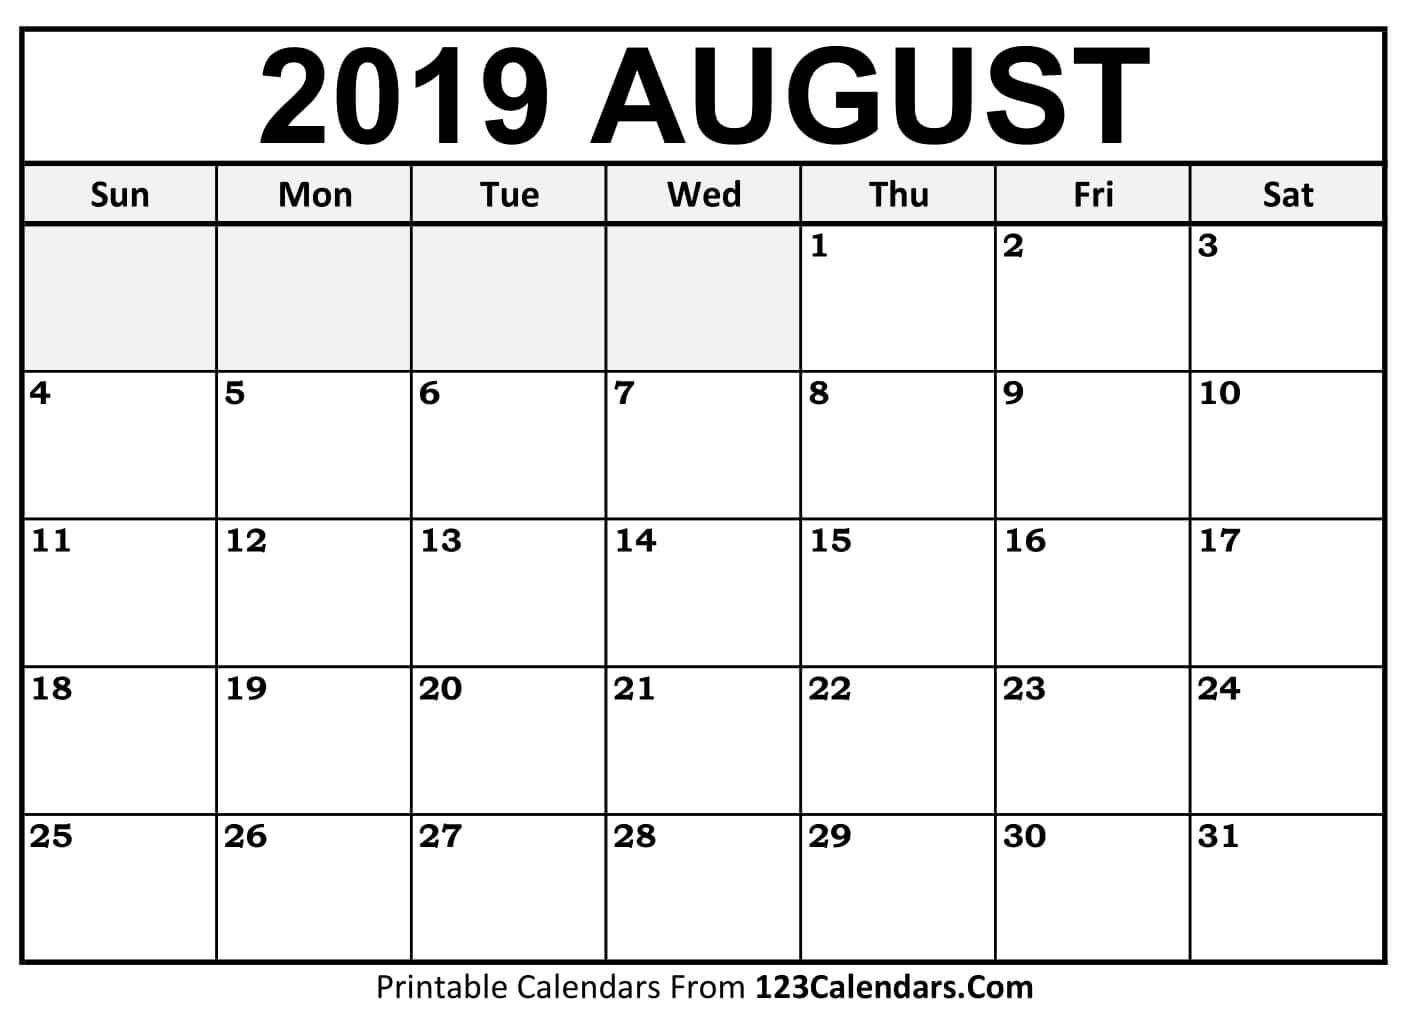 August 2019 Calendar Printable Templates | August 2019 Calendar pertaining to August Calendar Template Excel